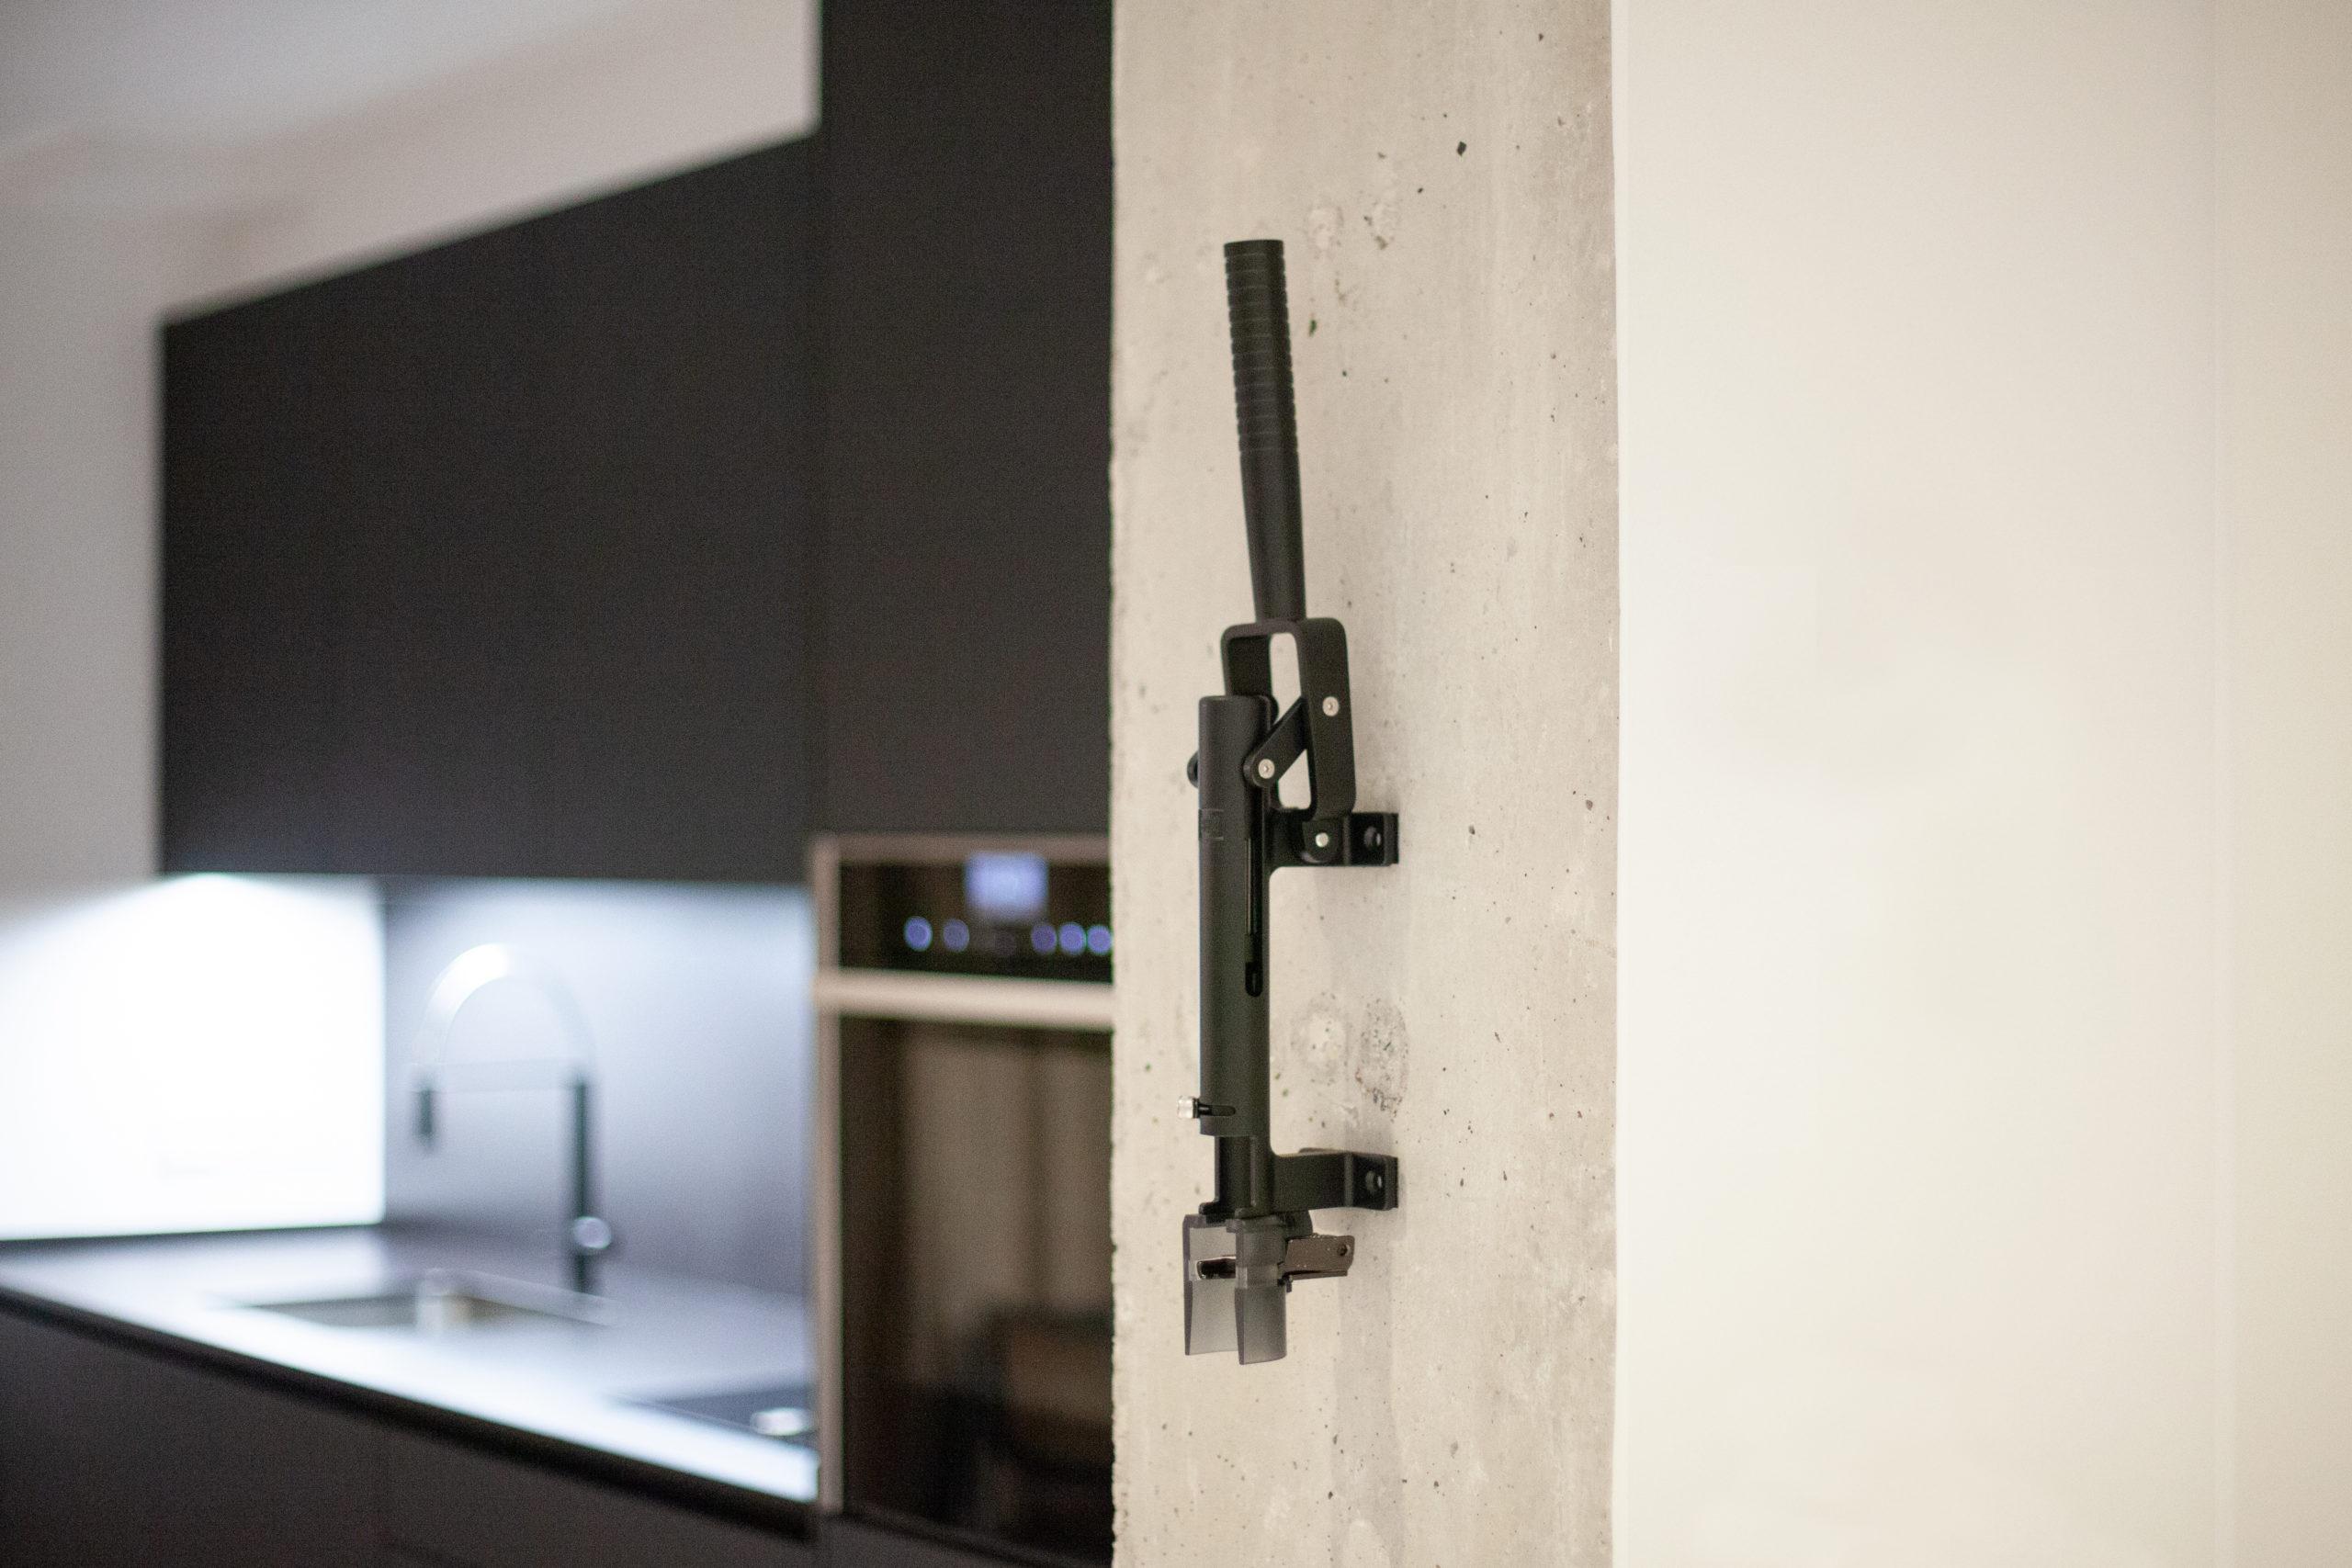 boj corkscrew kitchen